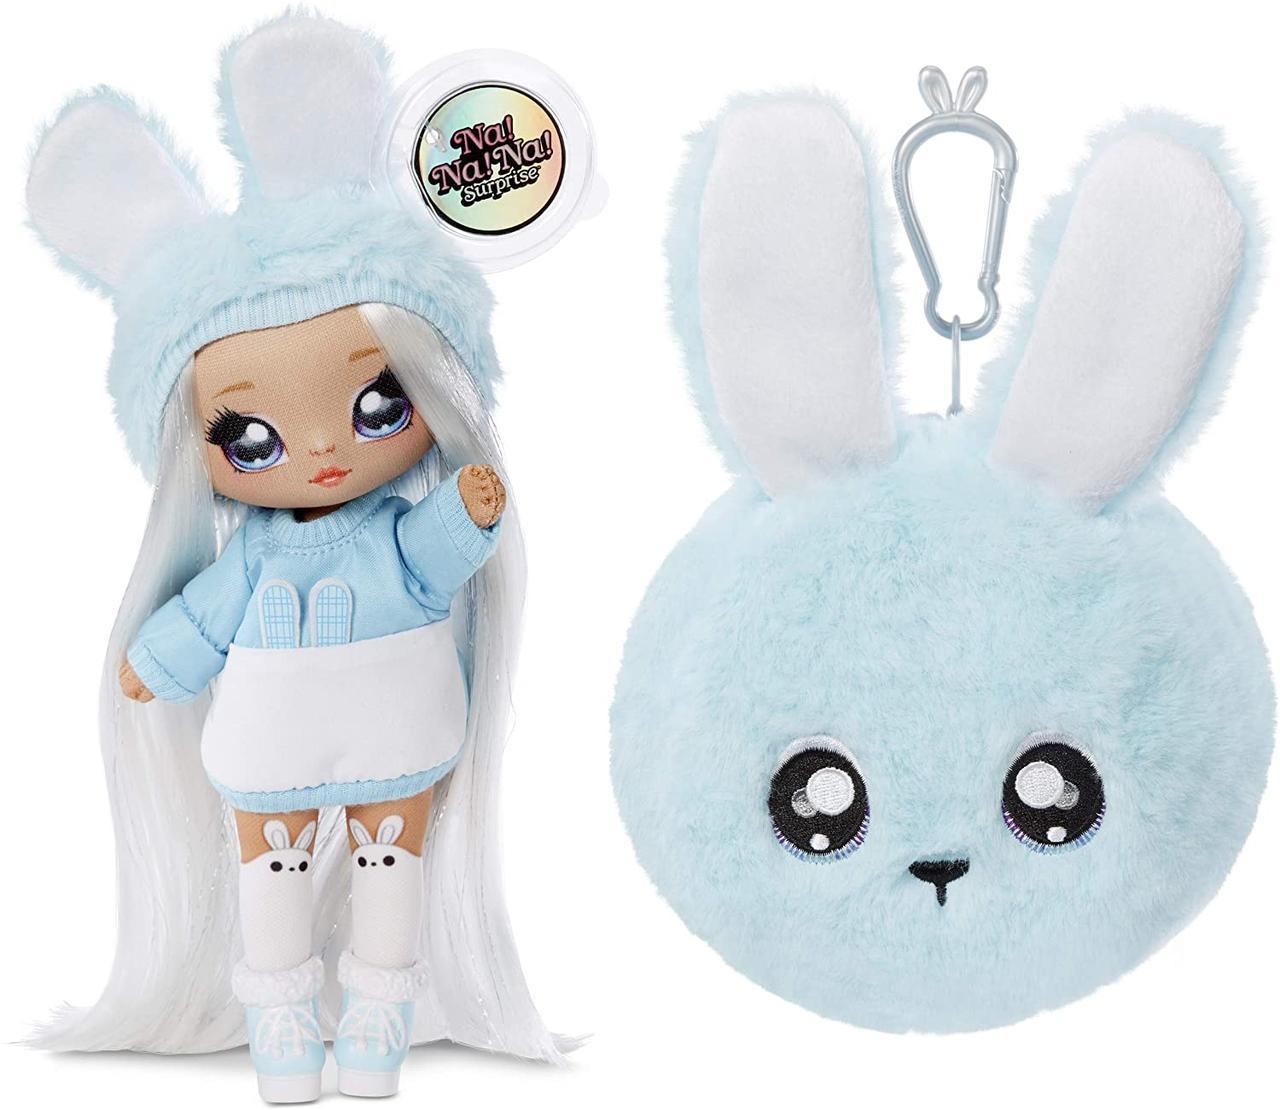 Na! Na! Na! Surprise S2 Мягкая куколка сюрприз с сумочкой Аспен Флафф 564737 aspen fluff Fashion Doll